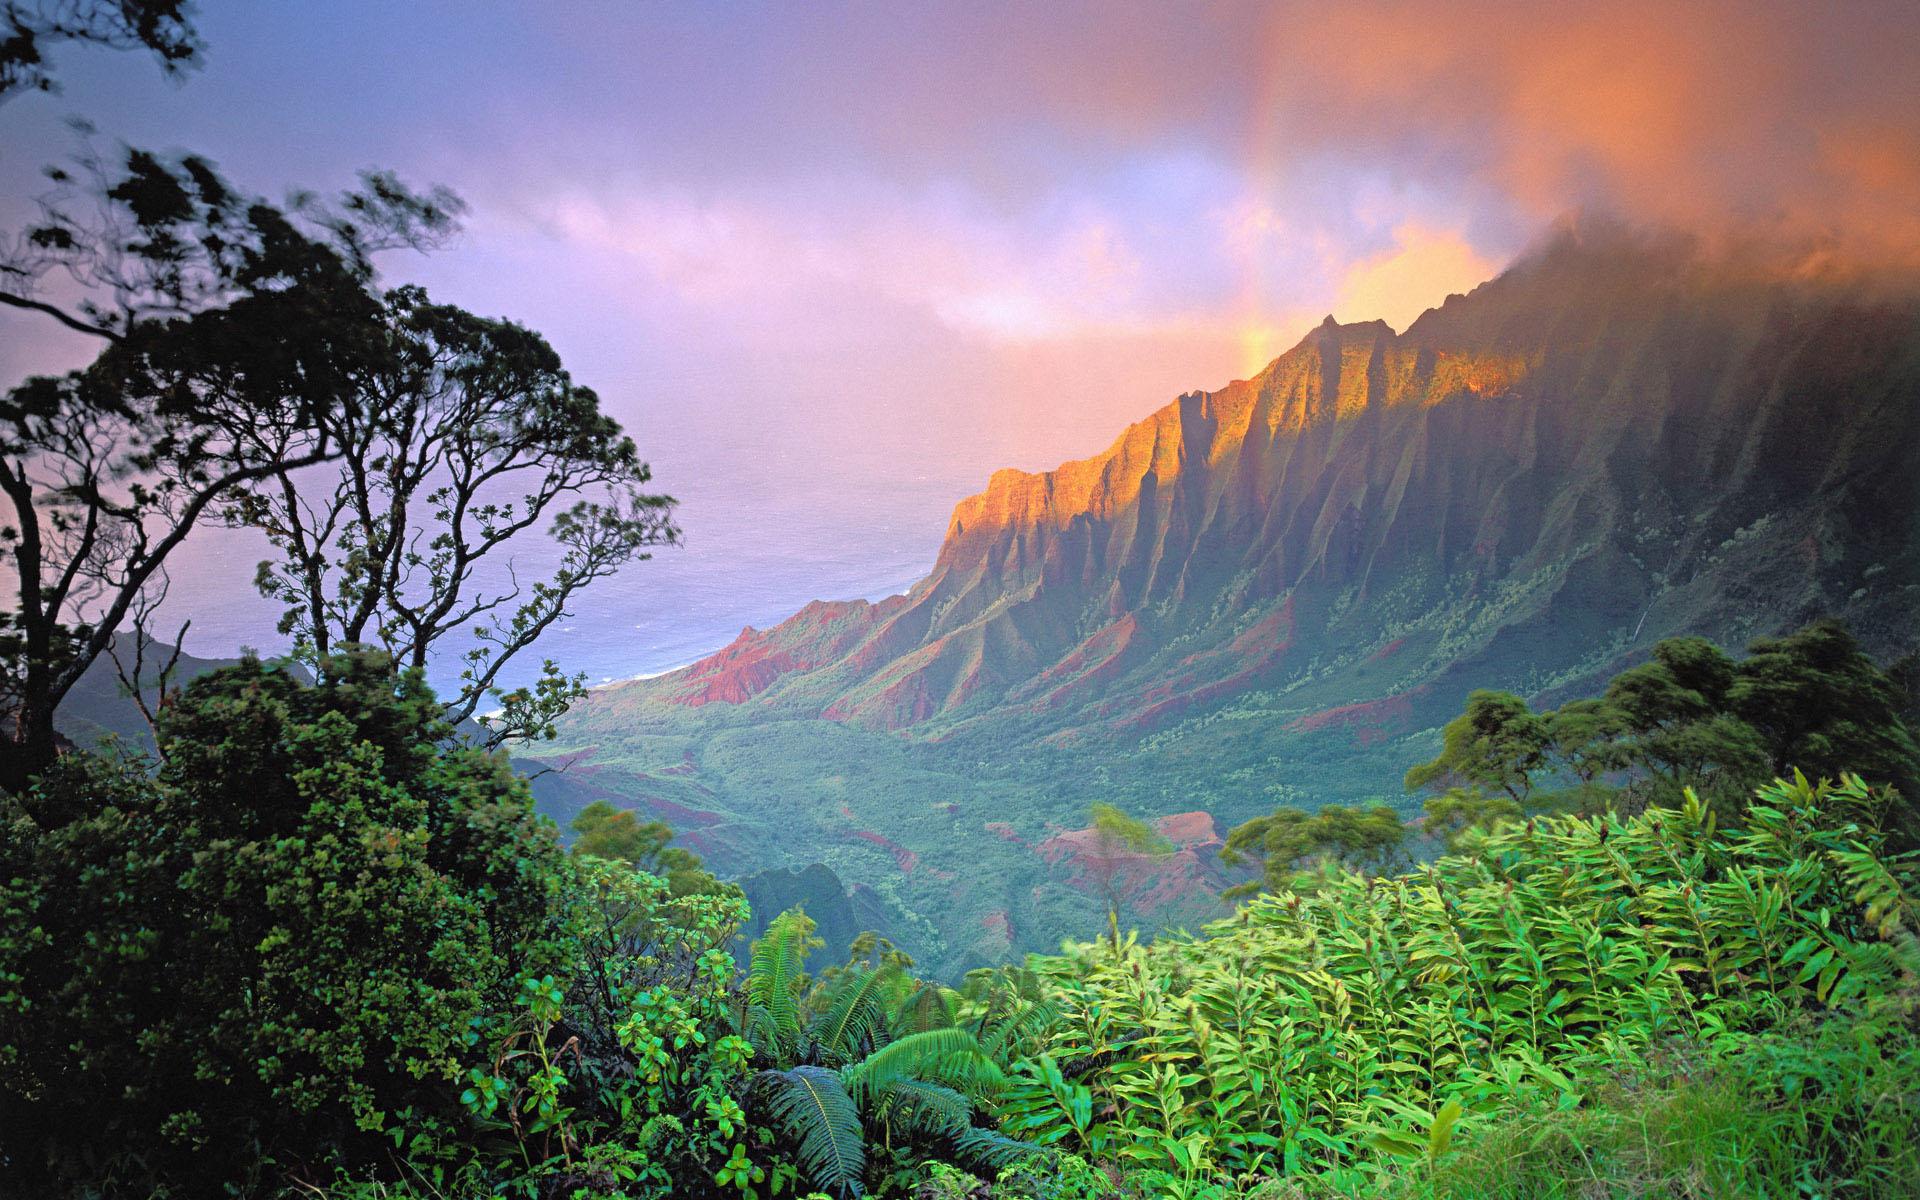 Image: http://www.desktopwallpaperhd.net/wallpapers/2/0/world-scenic-background-valentine-wallpaper-26464.jpg